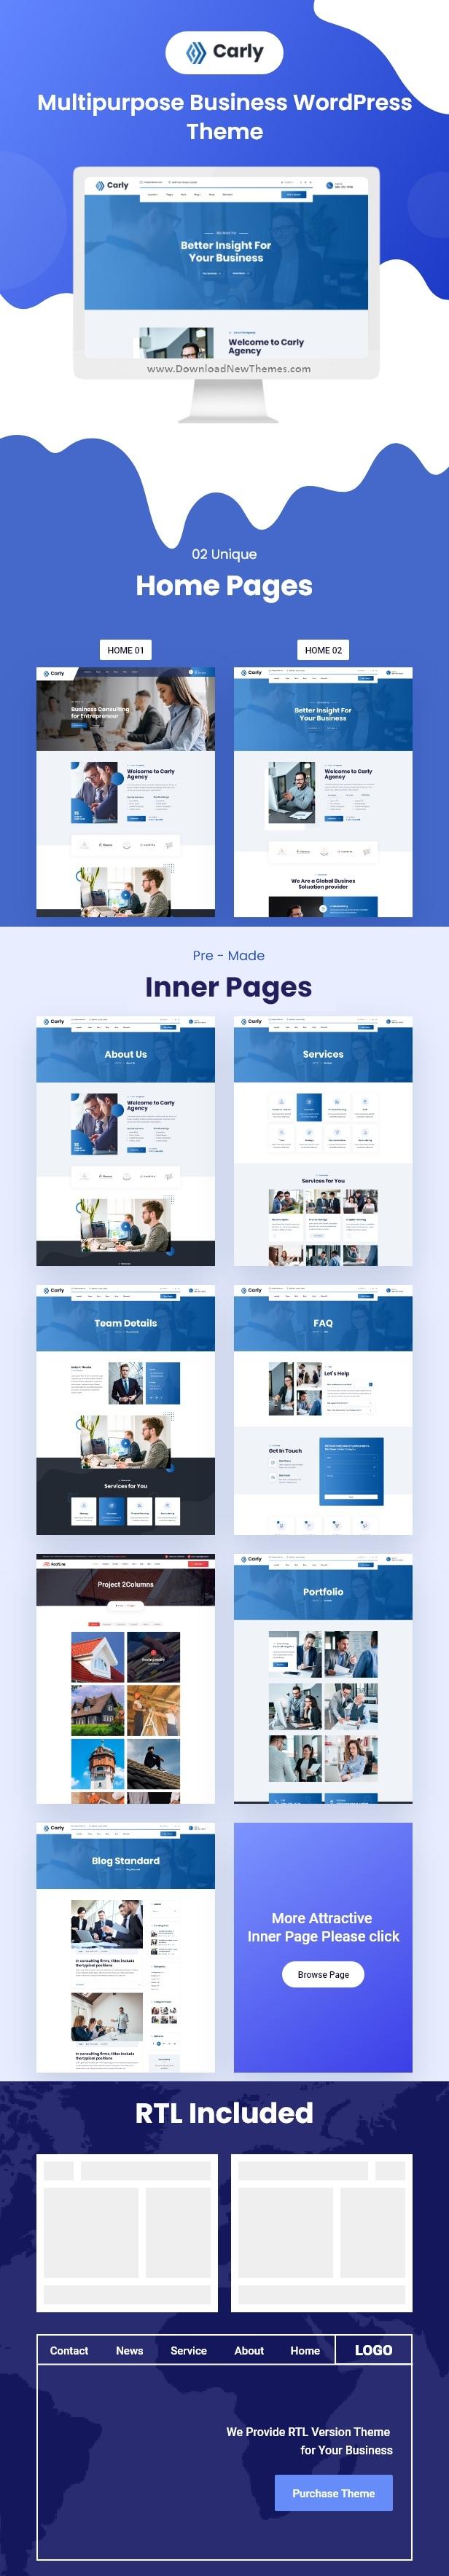 Multipurpose Business WordPress Theme